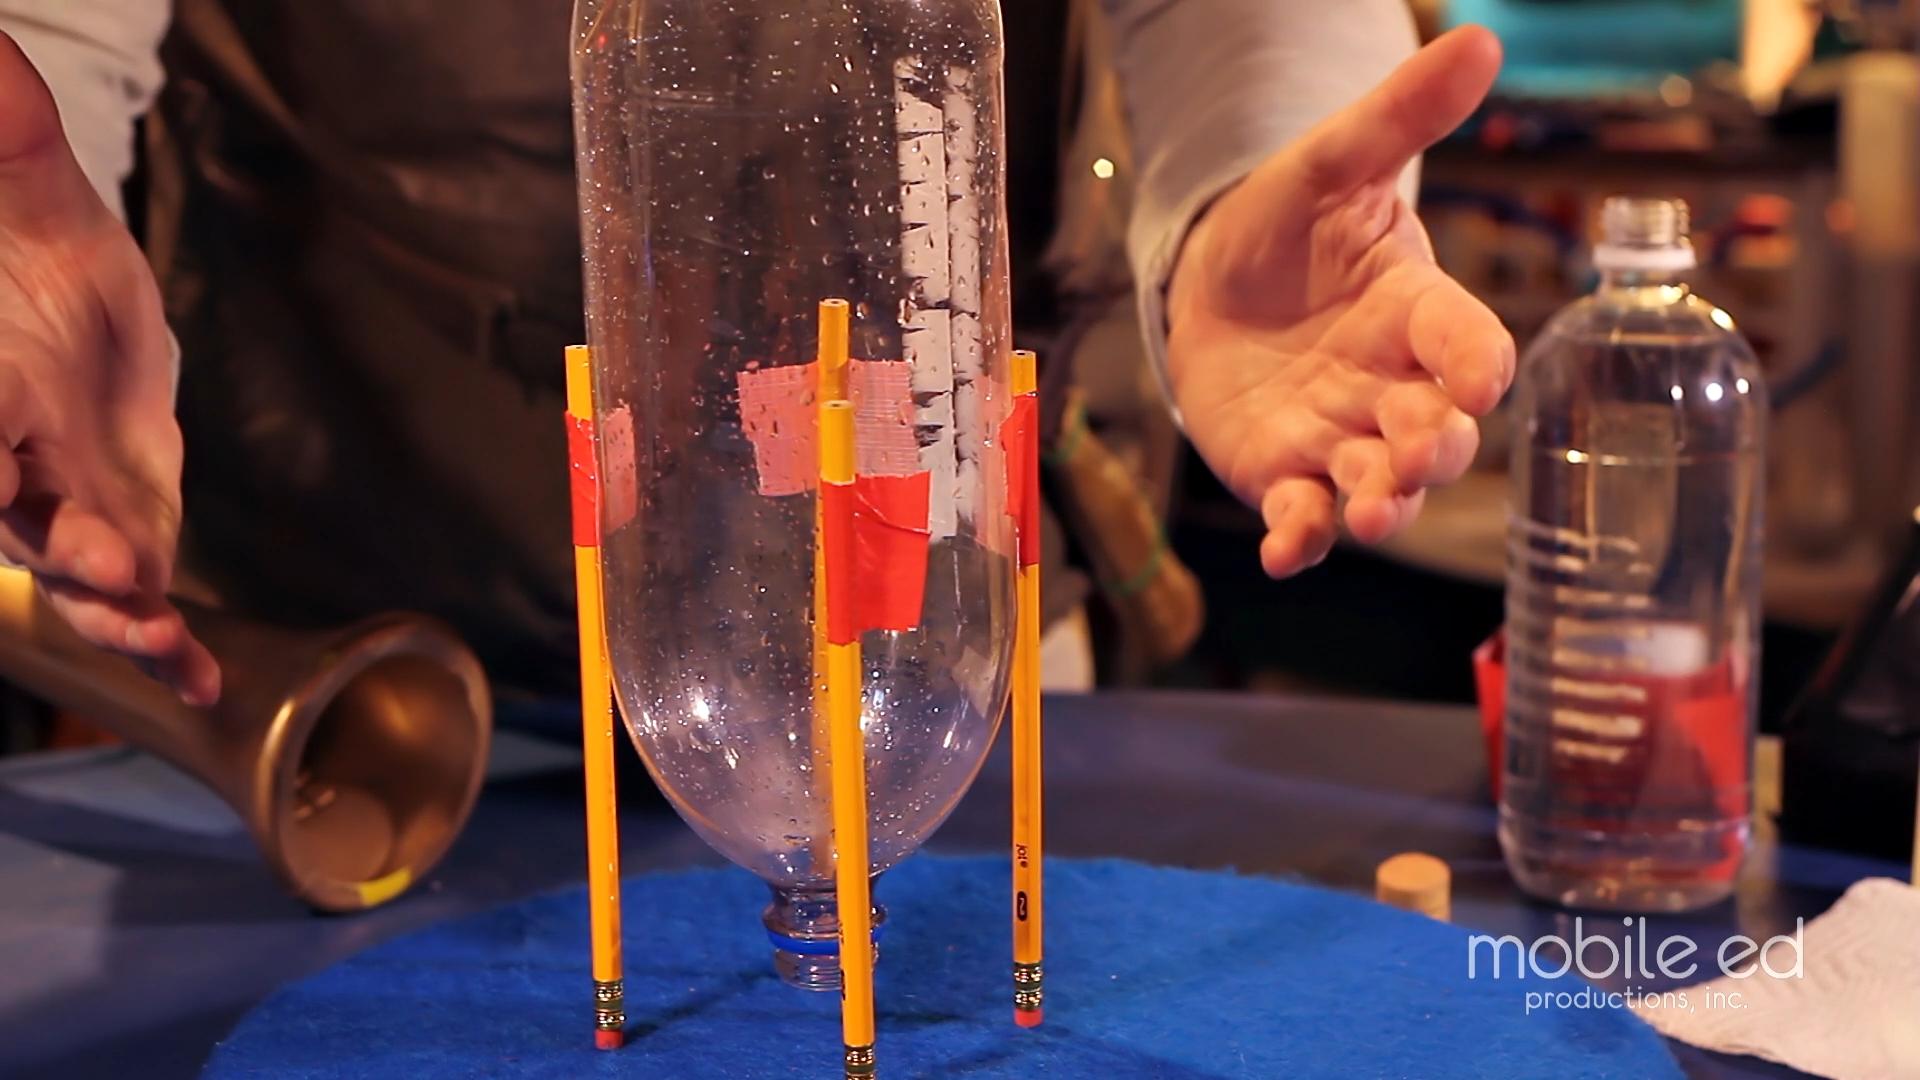 Build your own rocket - secure the legs  |  Handy Dan the Junkyard Man